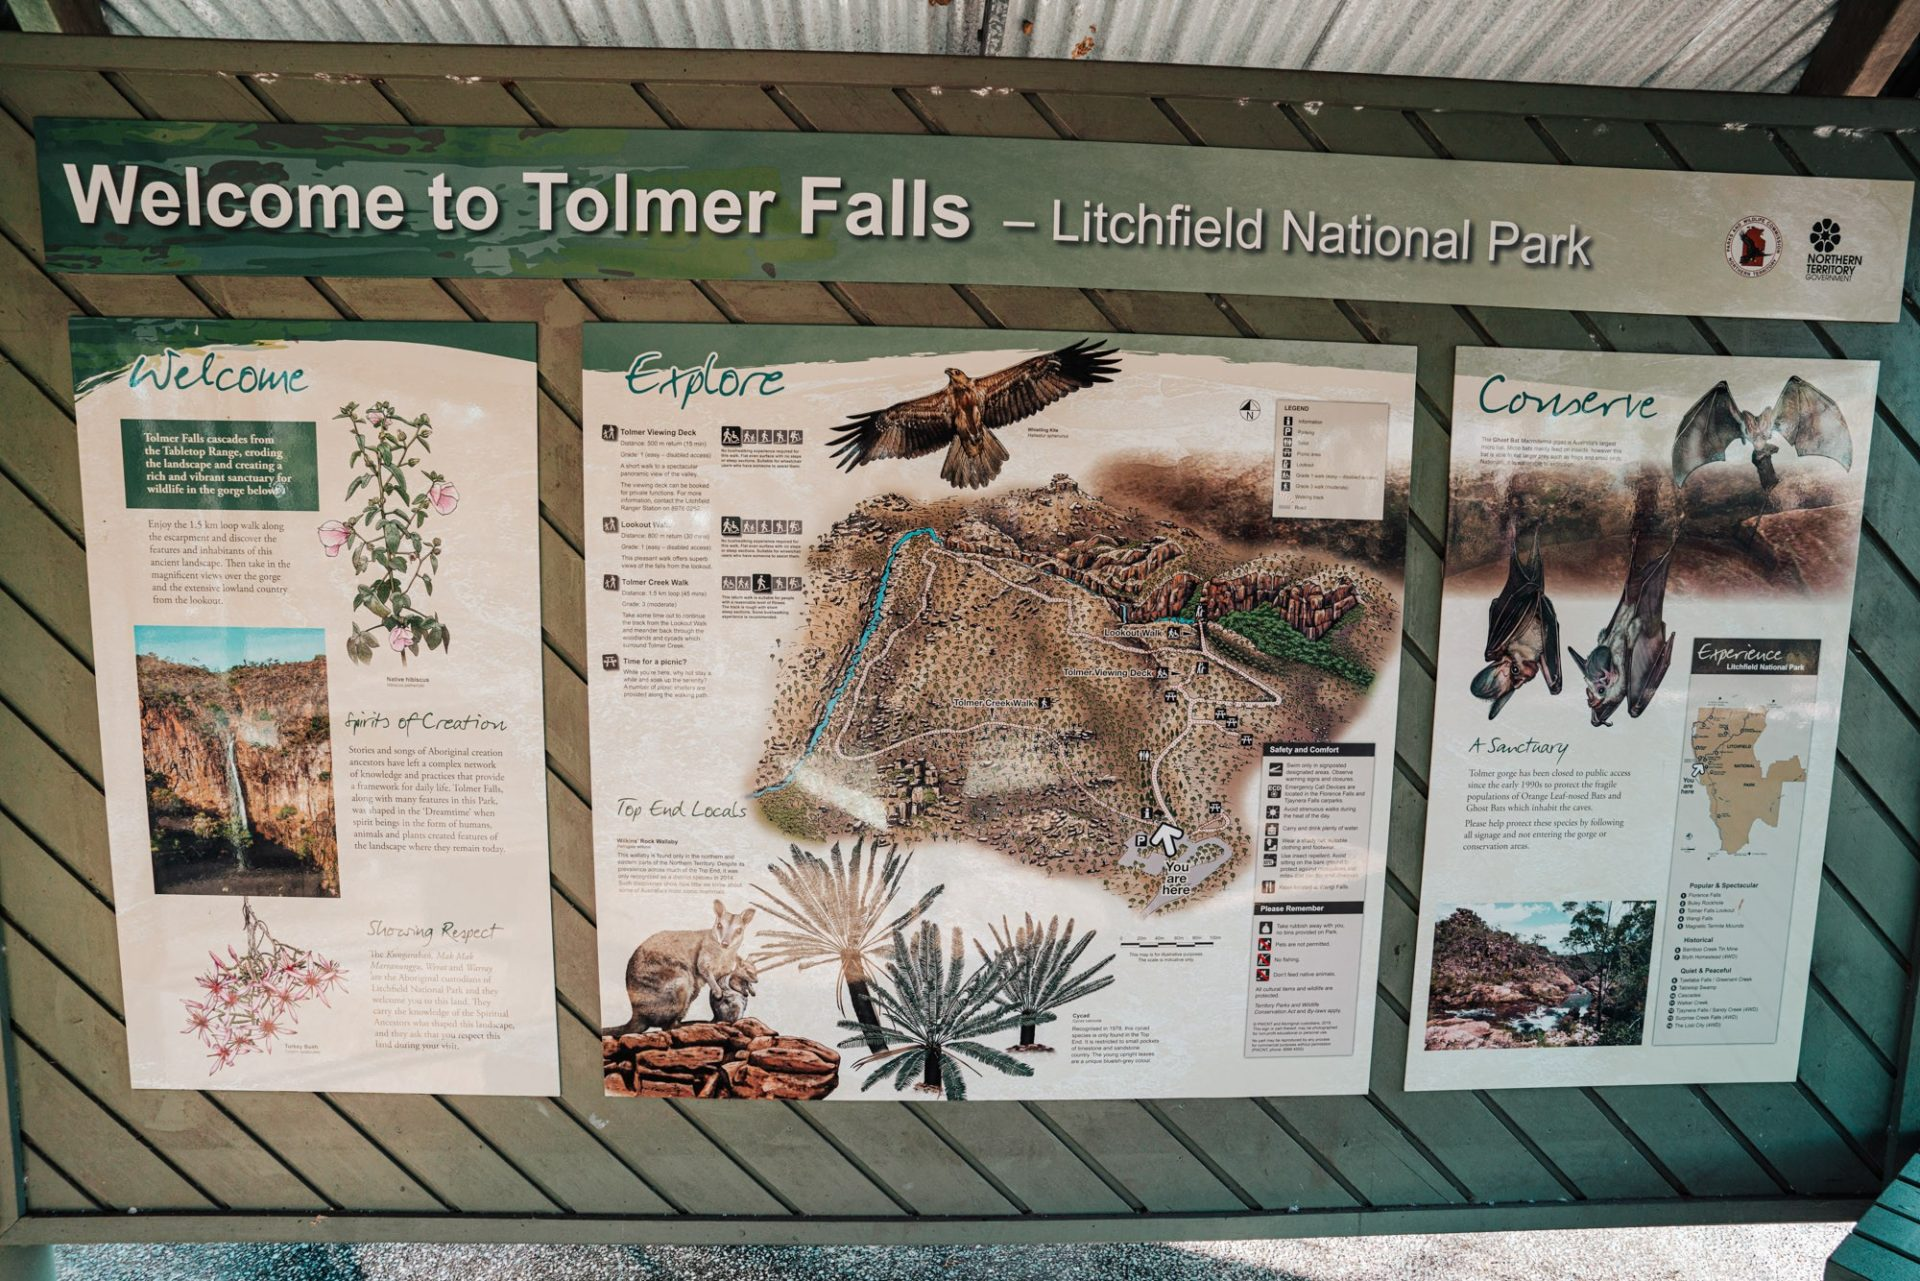 Tolmer Falls, Litchfield National Park